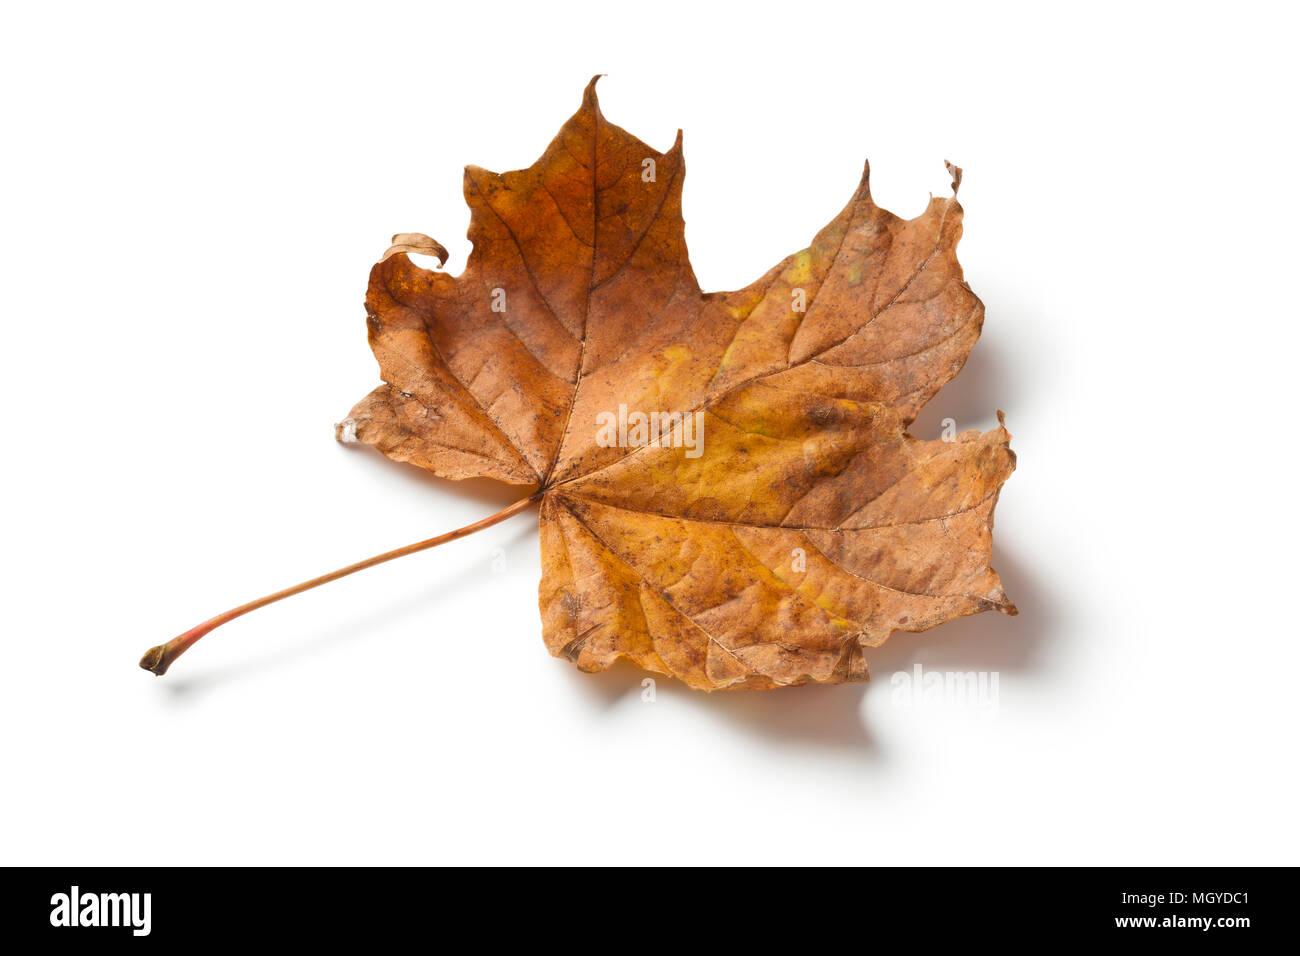 Single maple tree leaf in autumn on white background - Stock Image